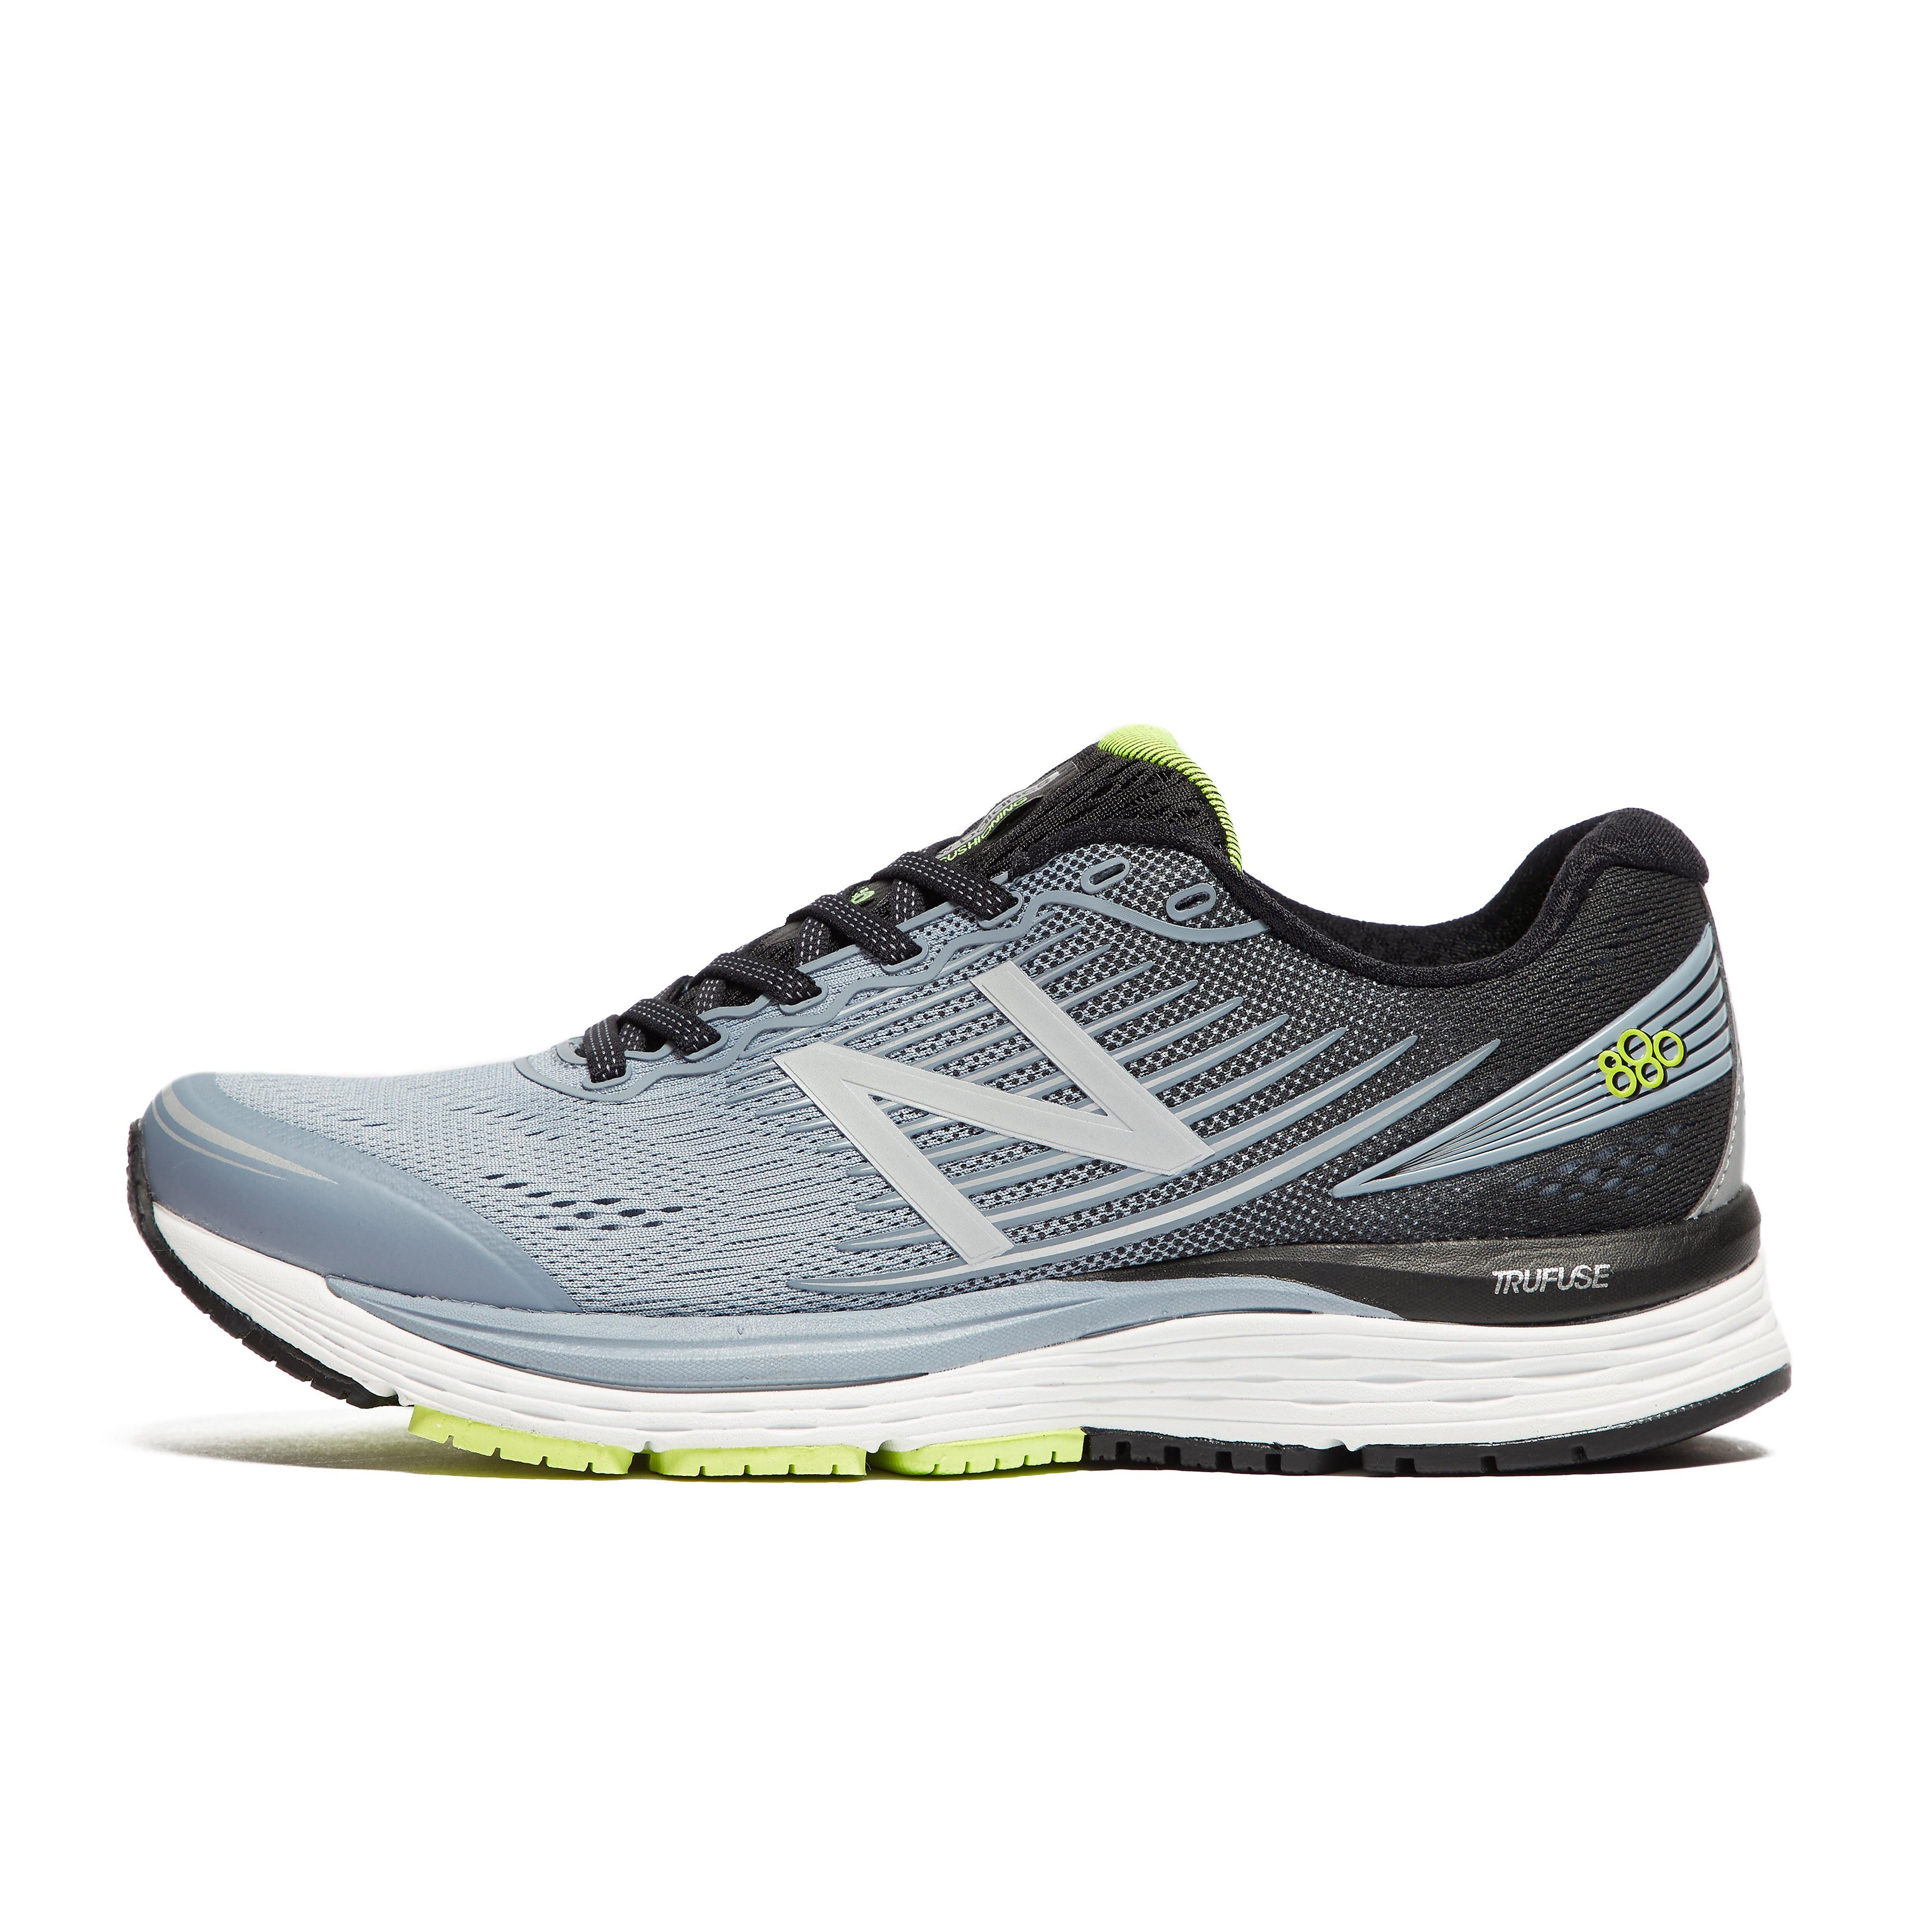 Men's New Balance 880v7 Running Shoes - Grey, Grey